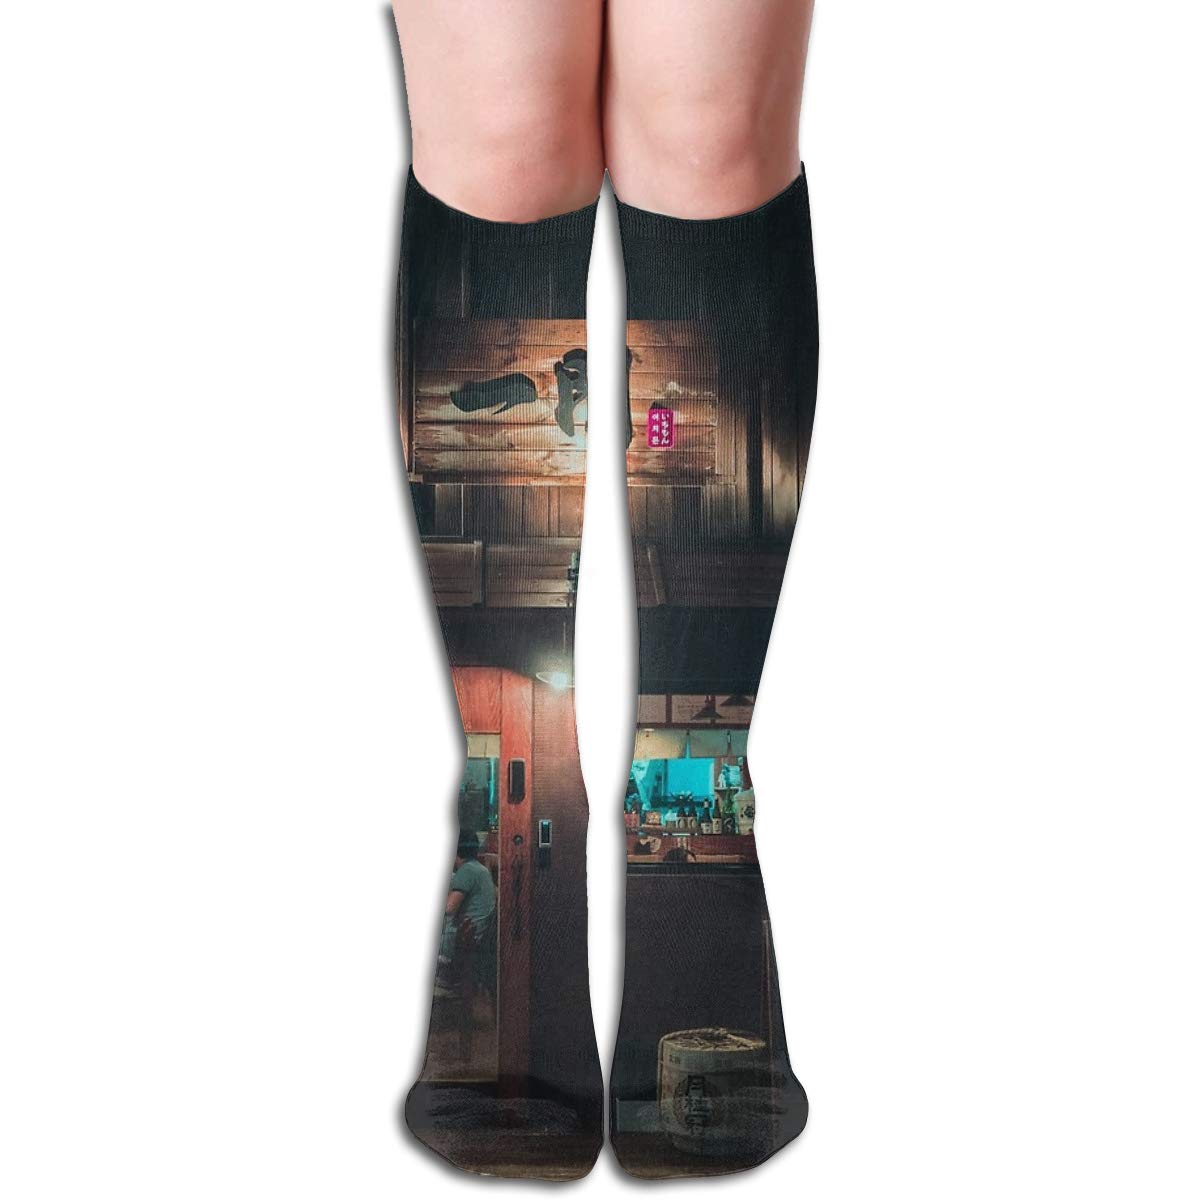 Last Nights Storm Unisex Compression Socks Athletic Tube Stockings Sport Long Socks One Size